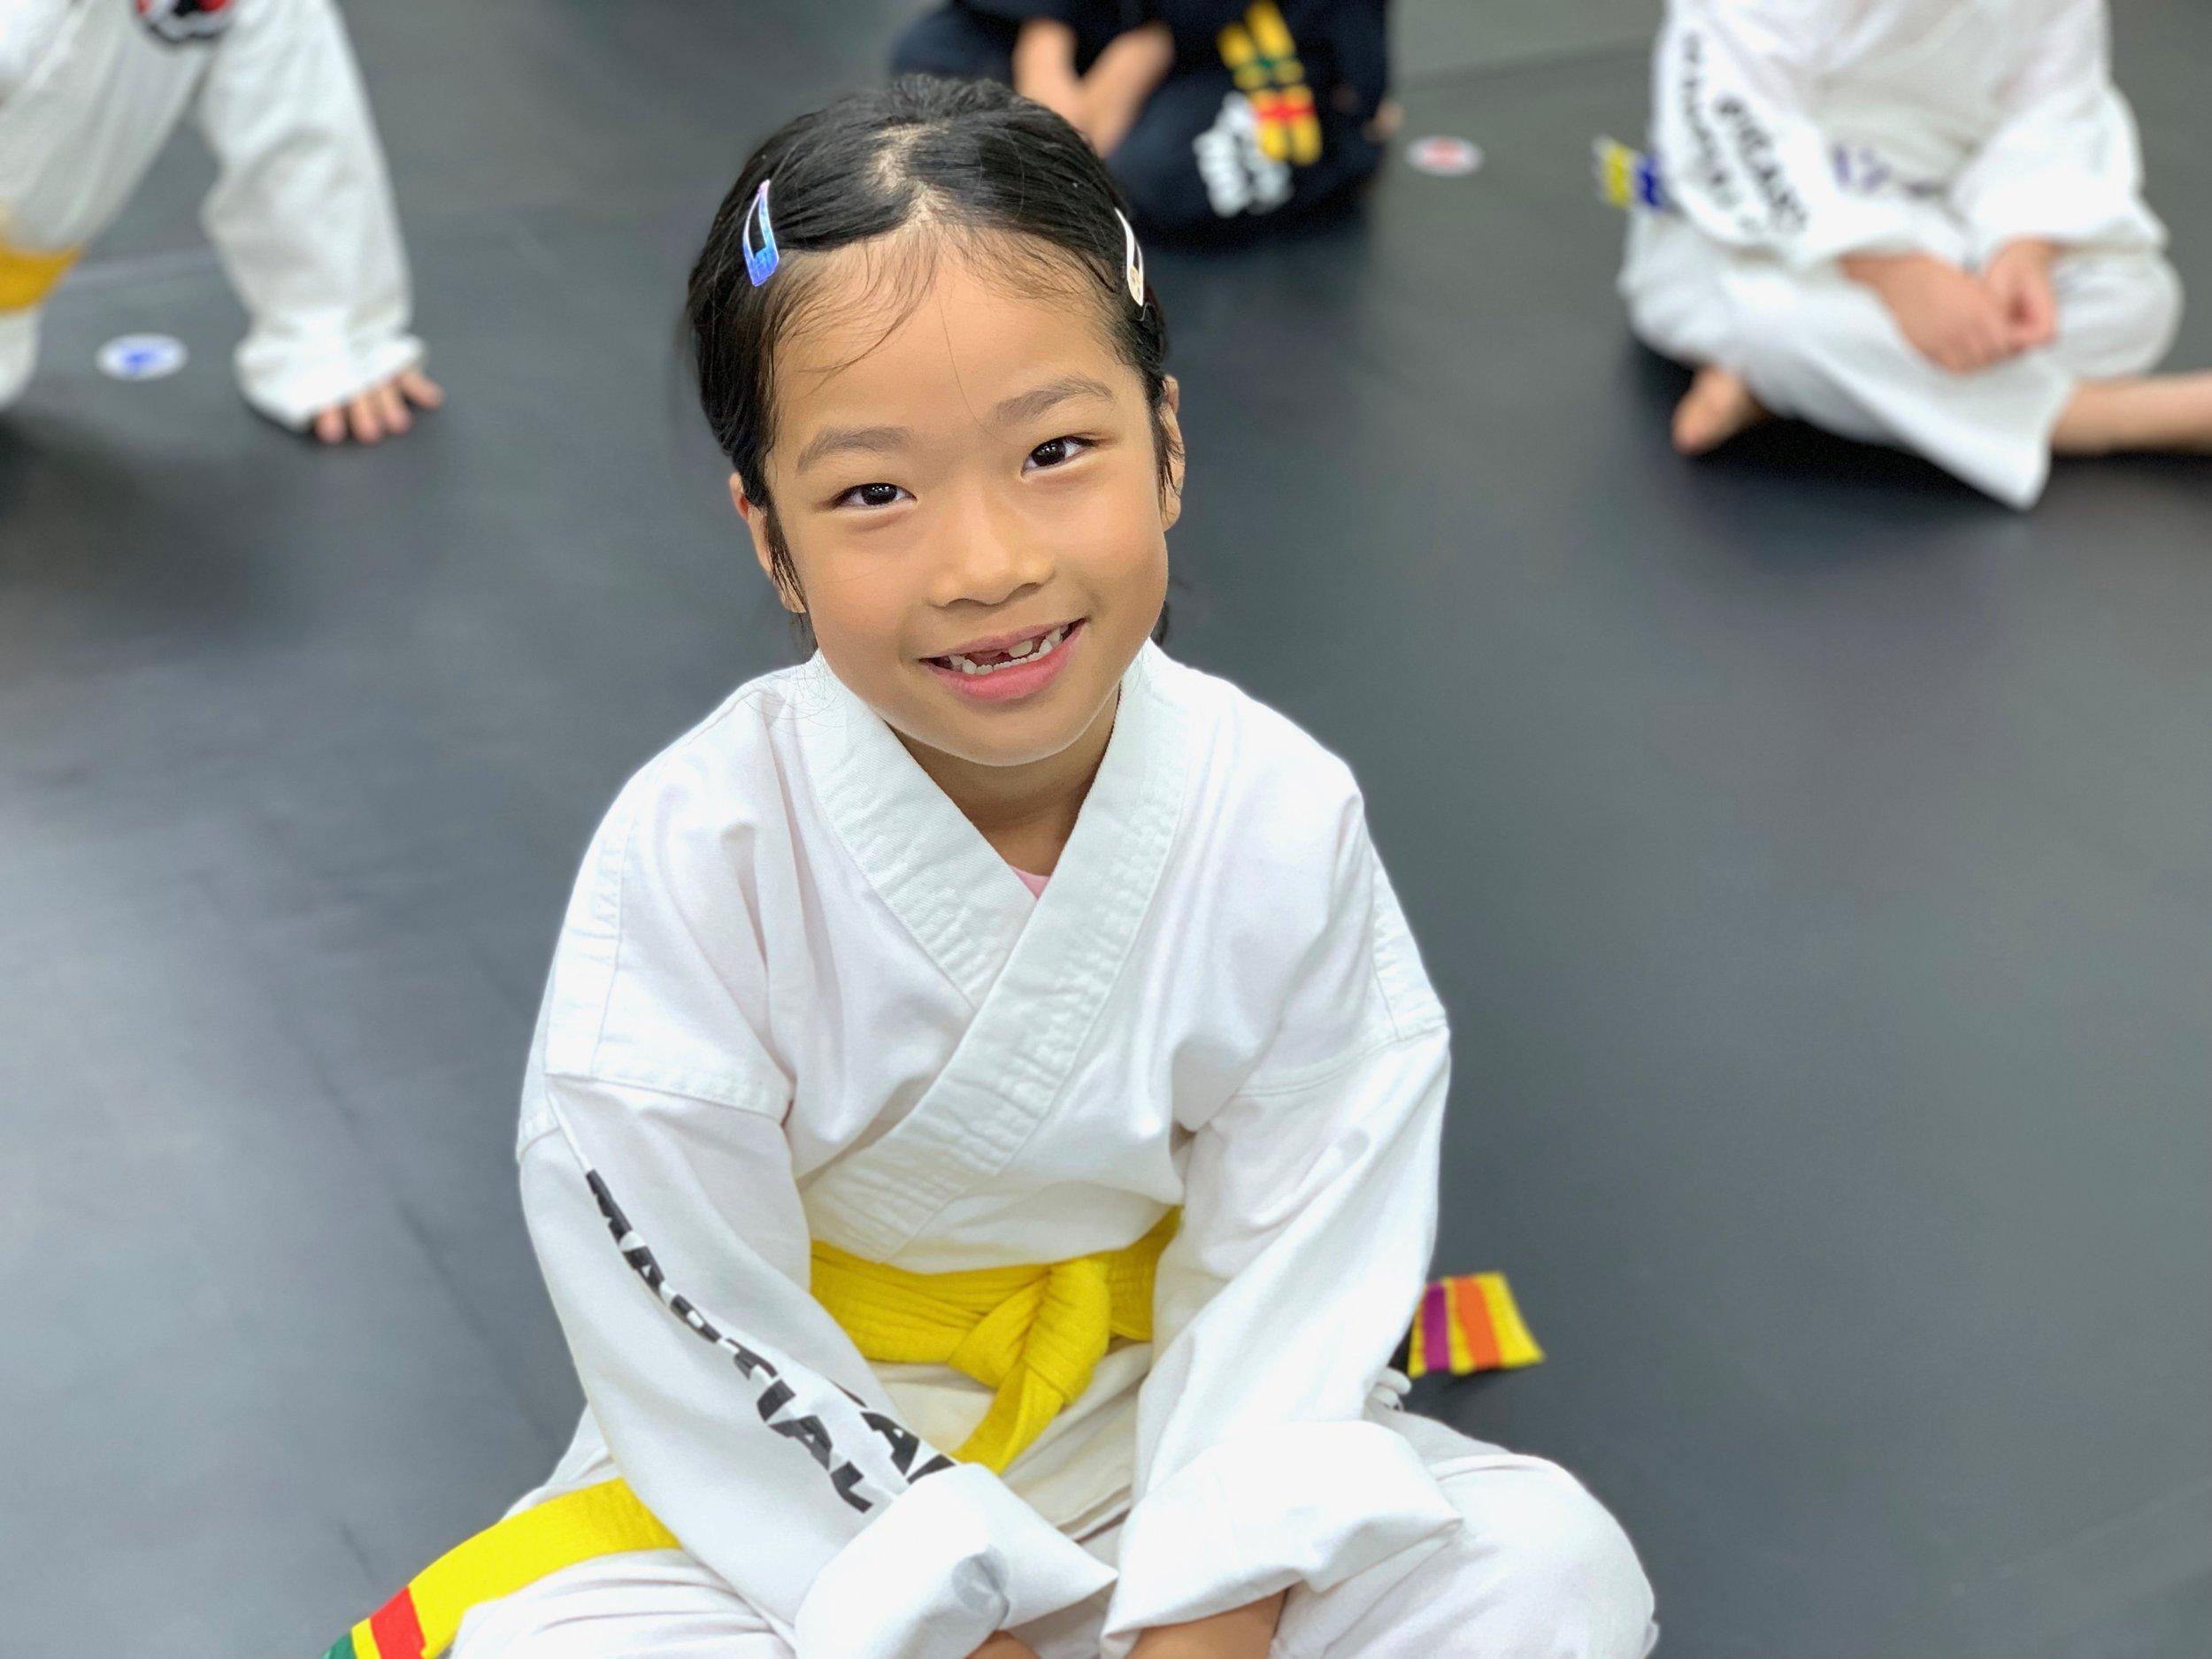 karate-kids-program-souhtlake-keller-grapevine-texas00053.jpeg